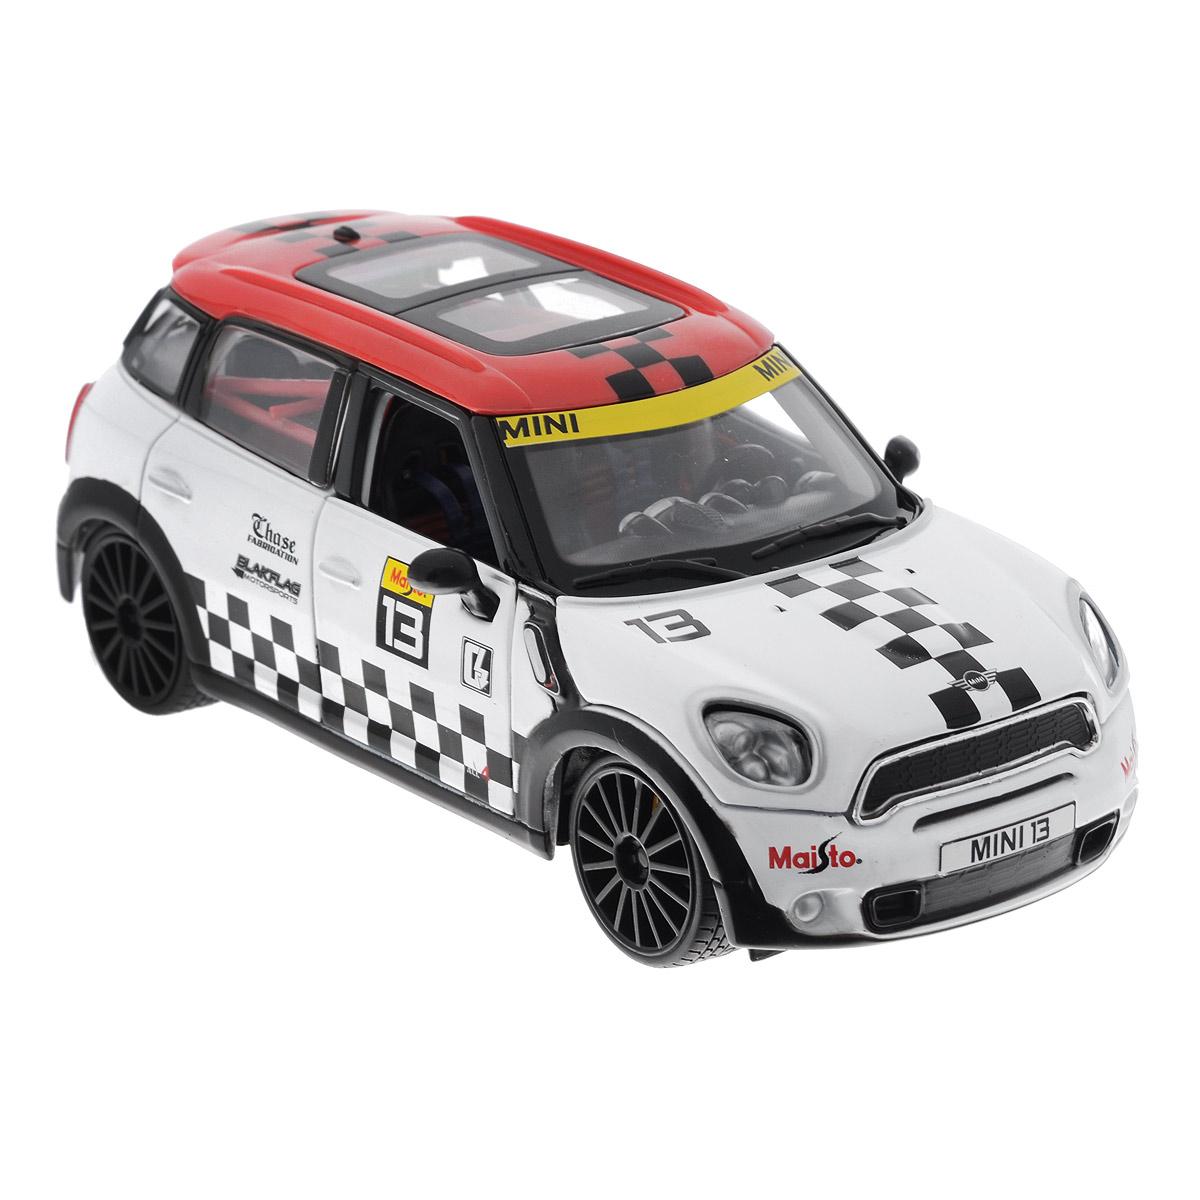 Maisto Модель автомобиля Mini Cooper Countryman